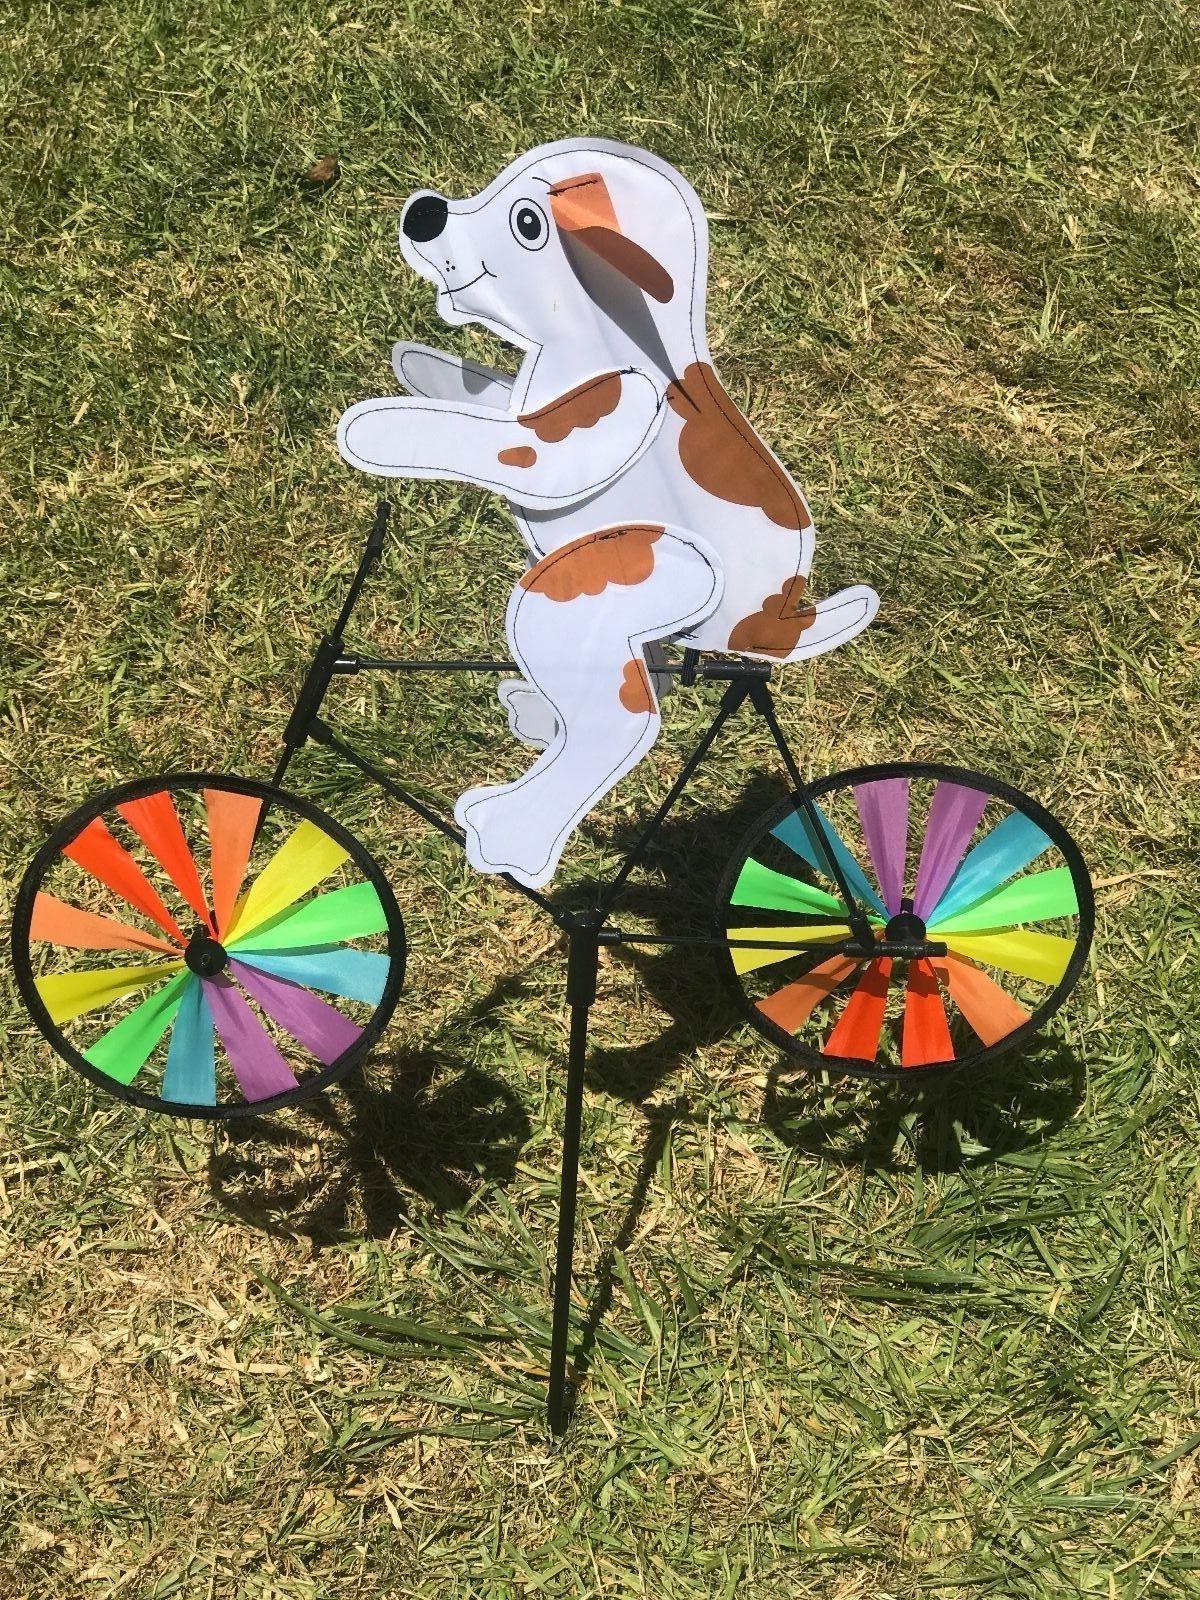 3D on Bike Windmill Whirligig Decor